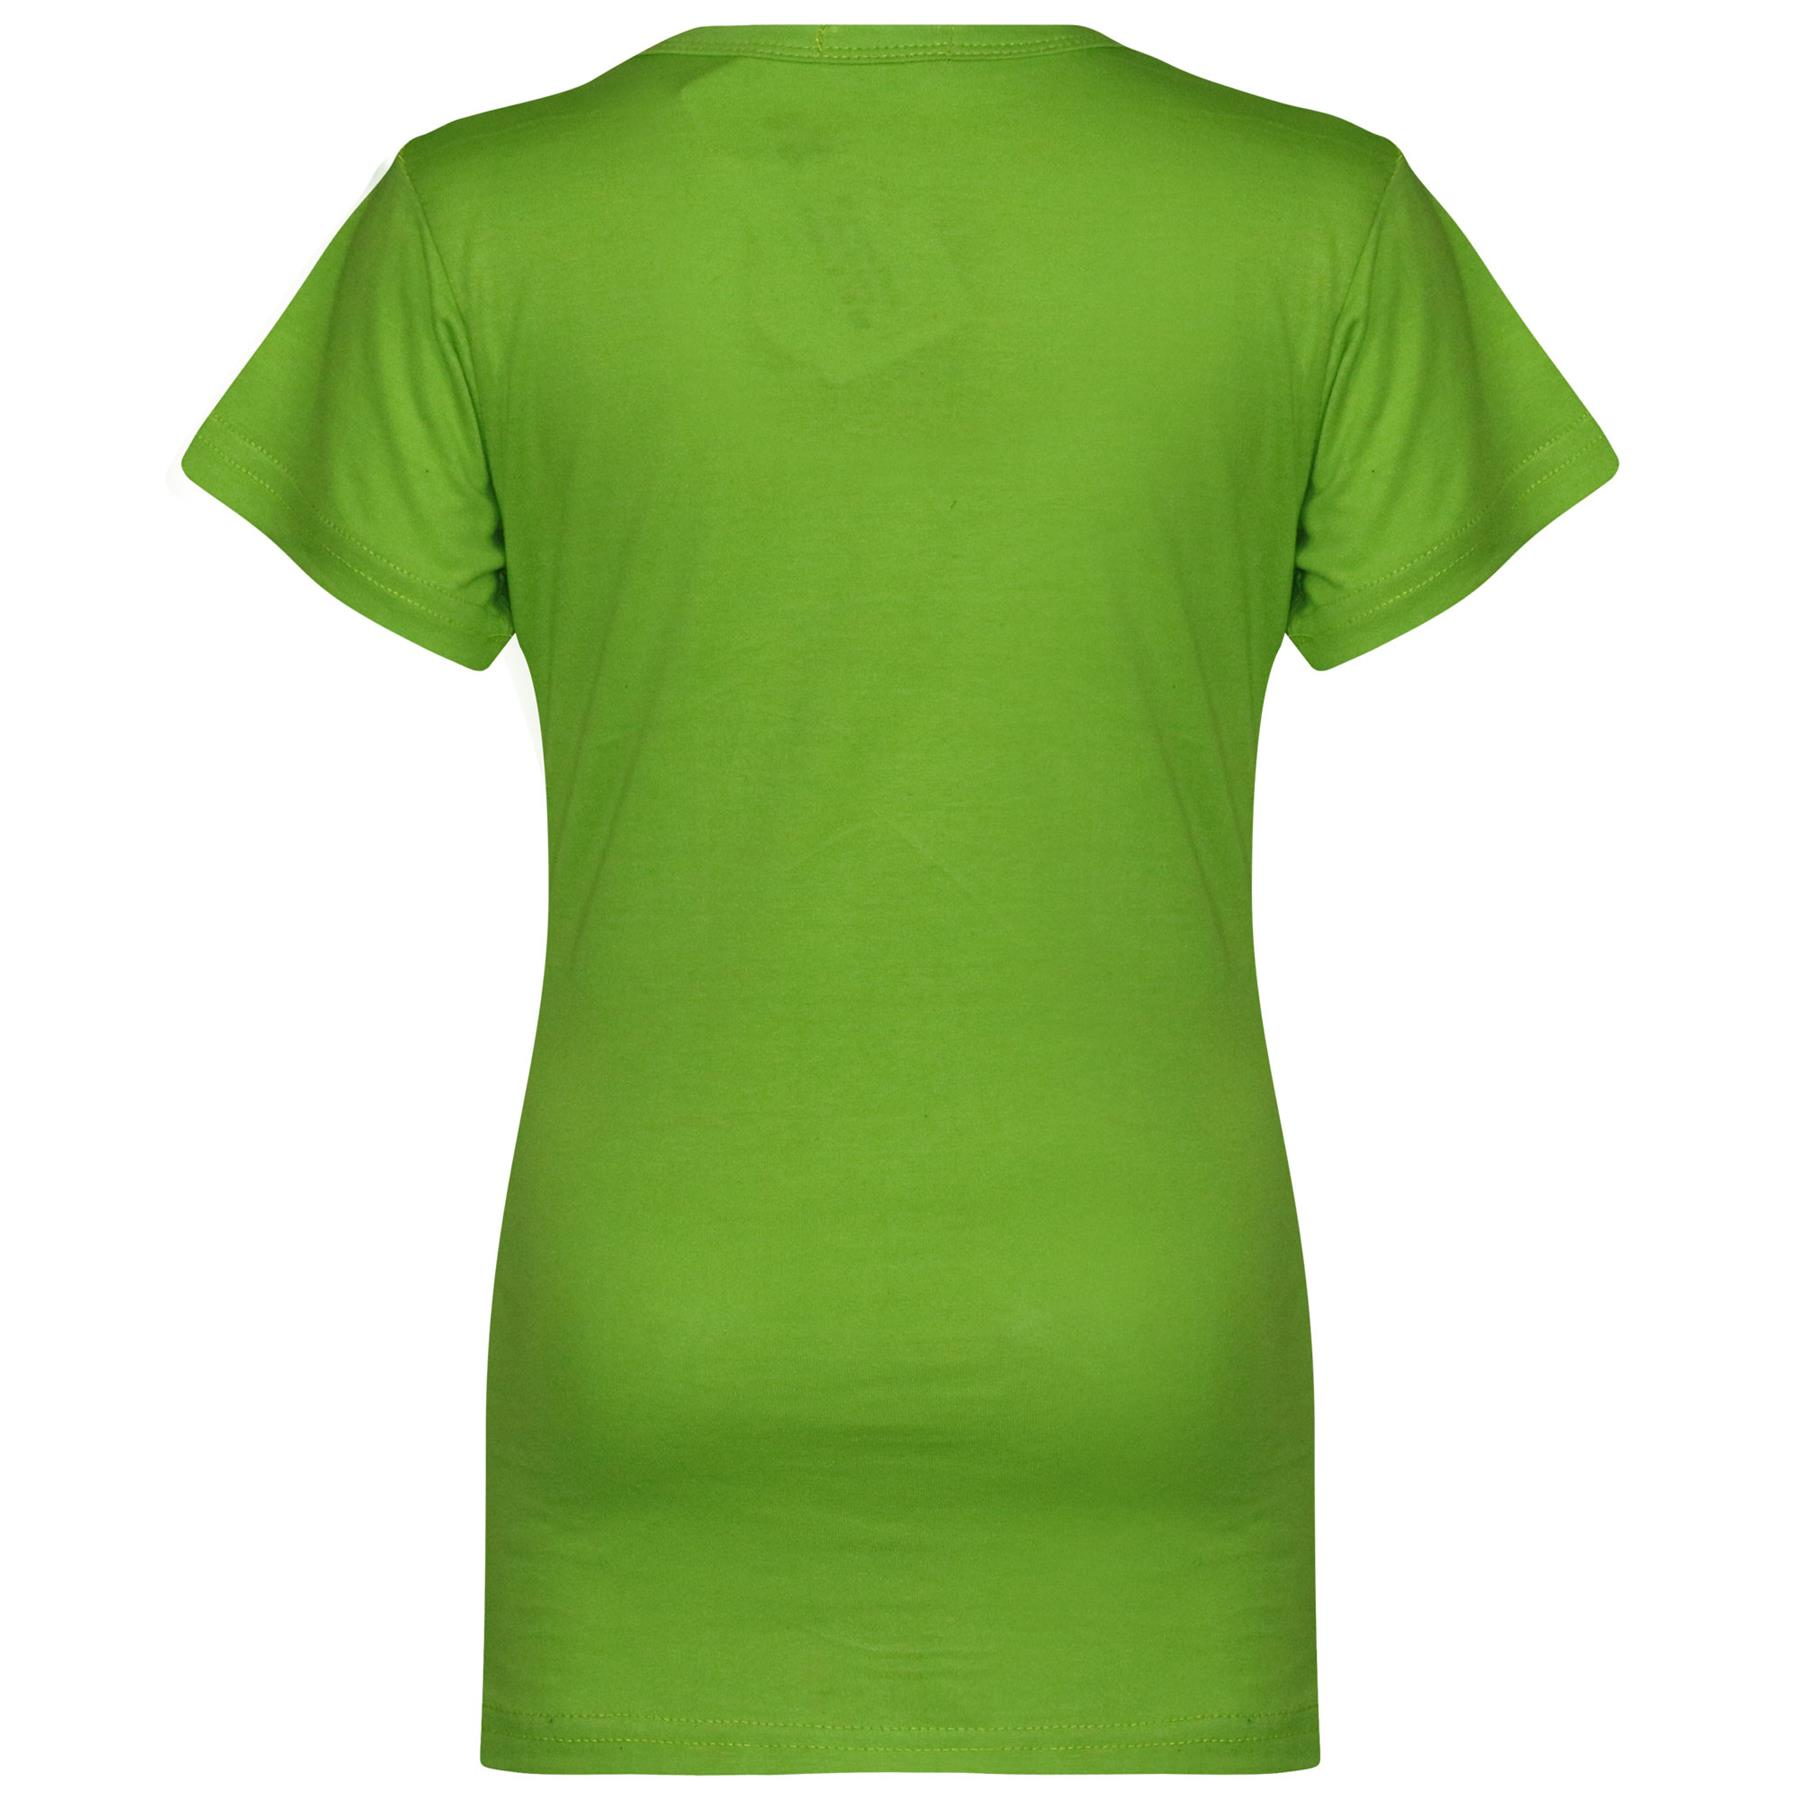 Kids-Girls-T-Shirts-Designer-100-Cotton-Plain-School-T-Shirt-Top-New-Age-3-13Yr thumbnail 24